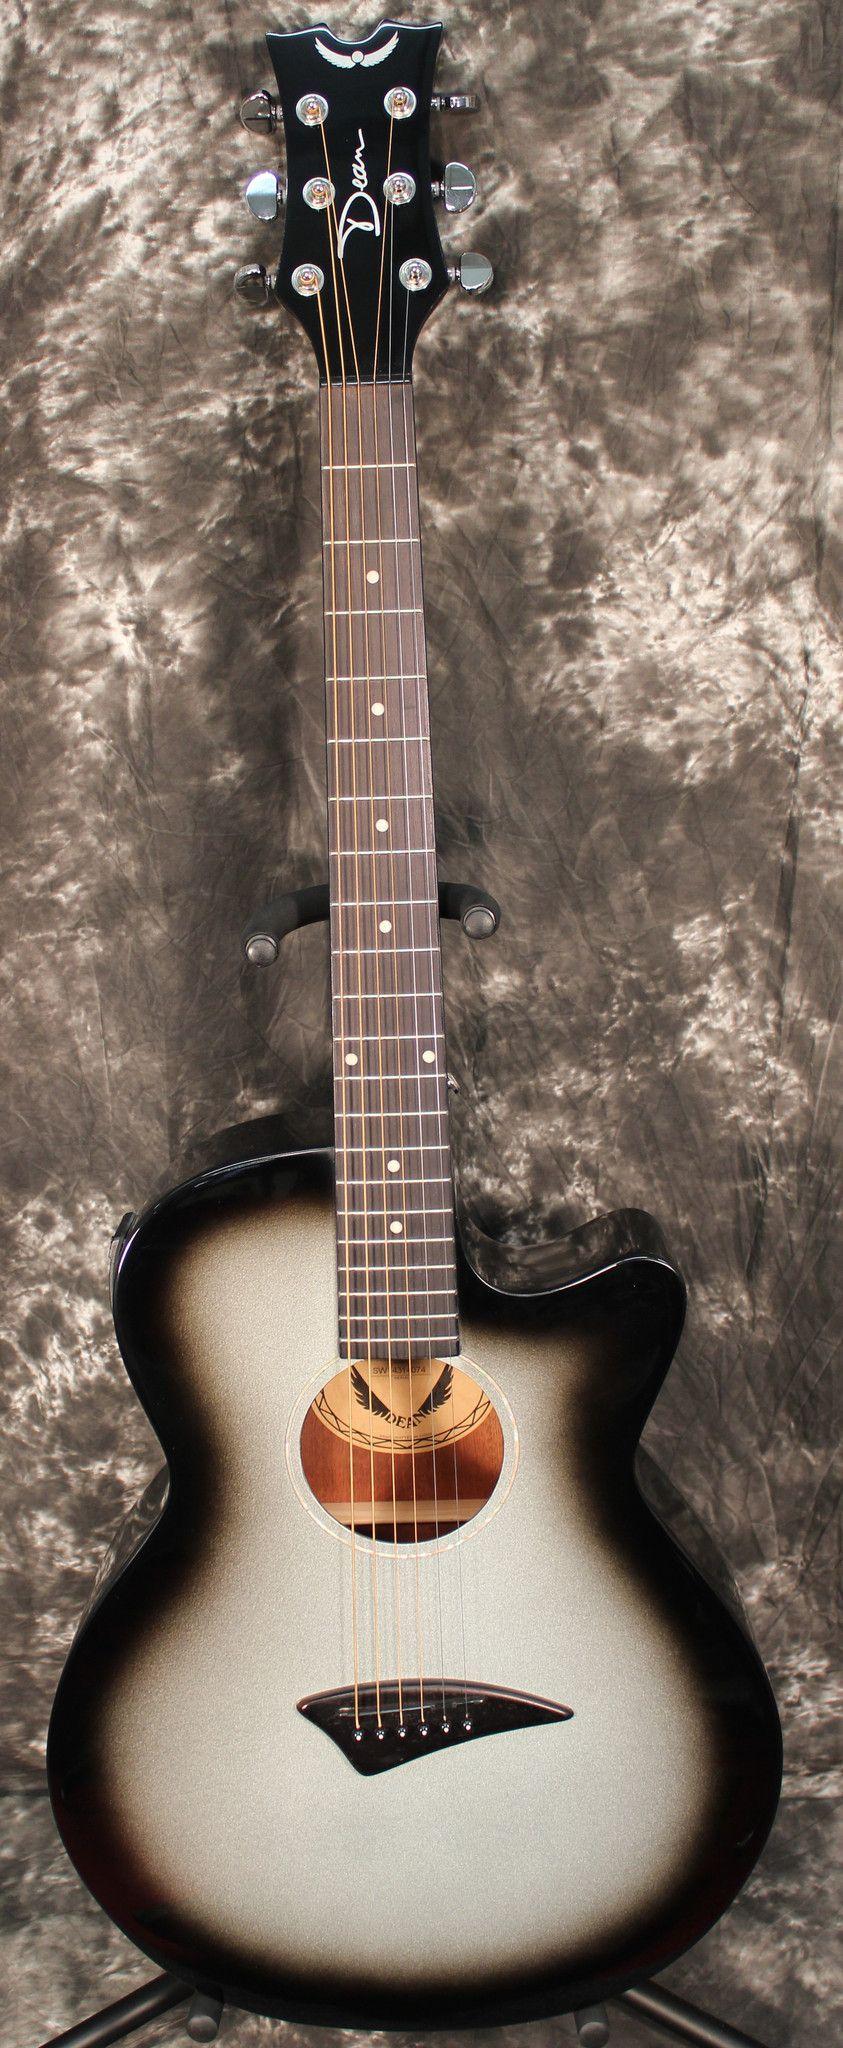 2015 Dean Axcess Performer Silverburst Cutaway Acoustic Electric Guitar